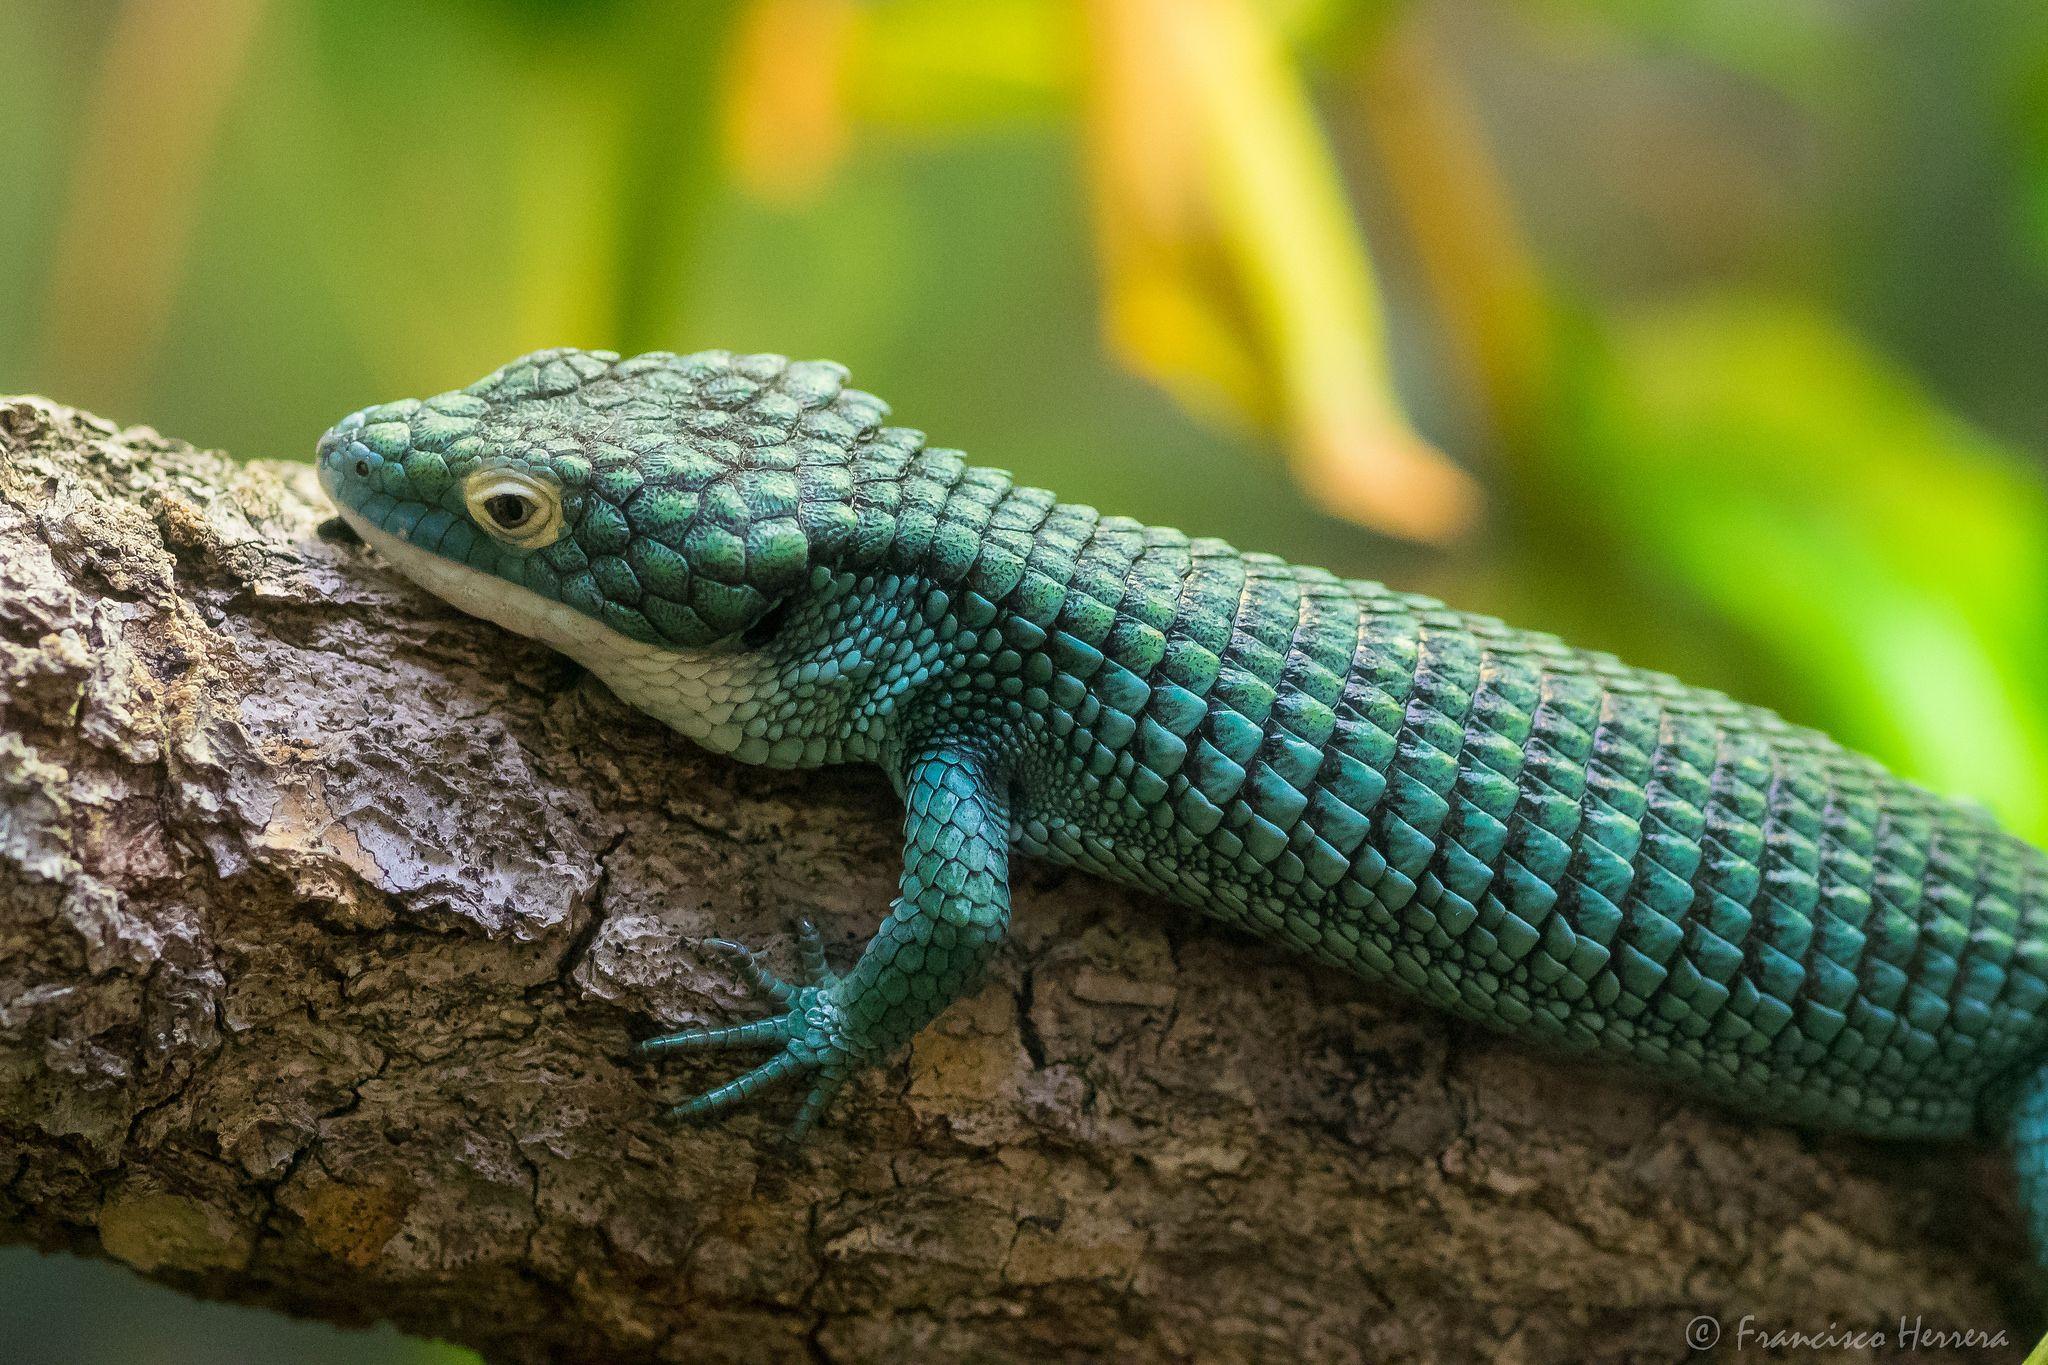 Terrestrial Arboreal Alligator Lizard (Abronia graminea